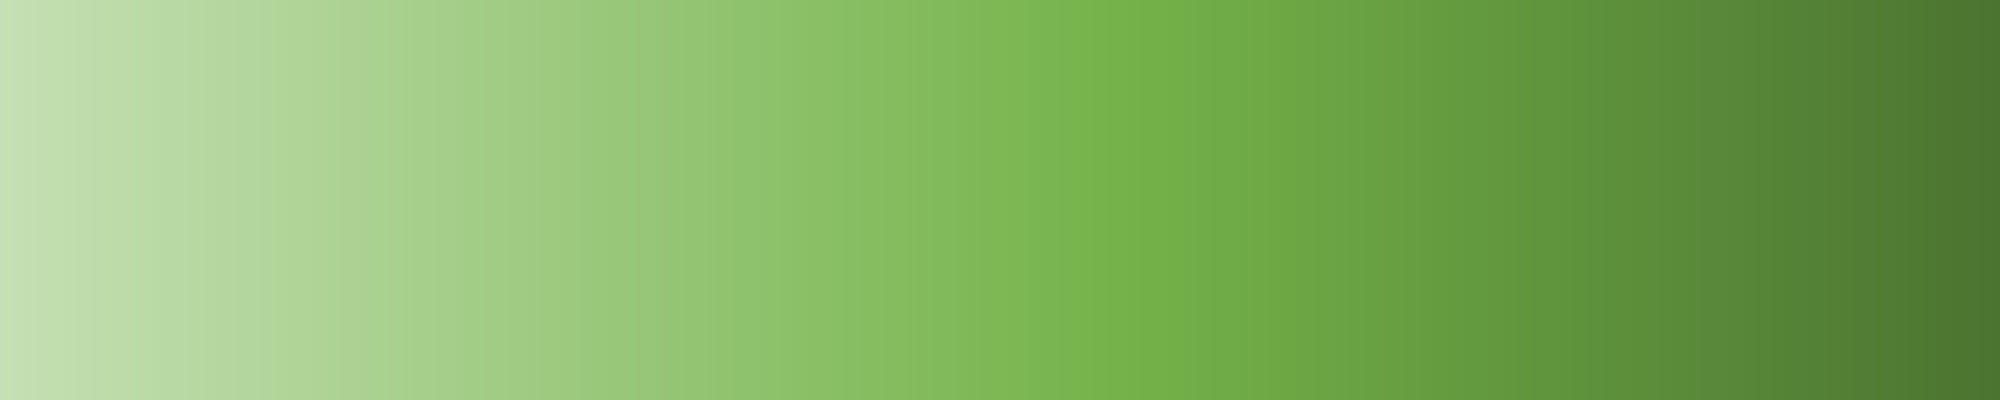 hijau6